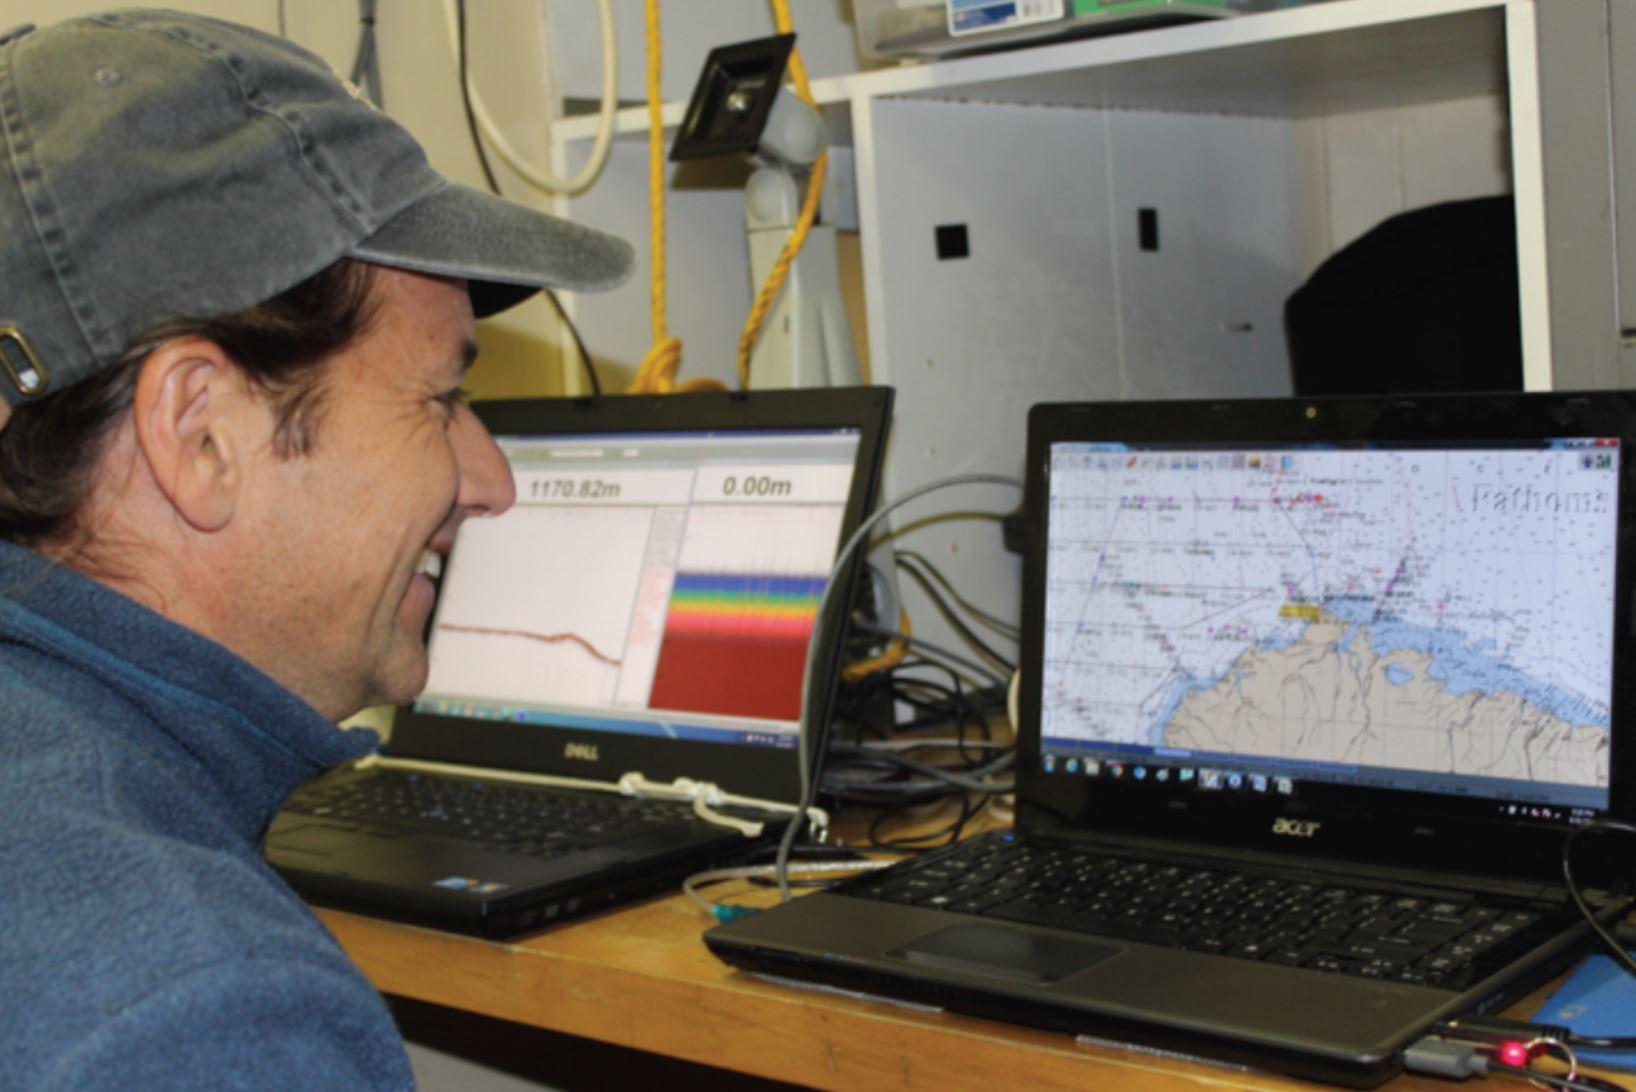 Alex De Robertis explaining the mechanisms of the echogram and an interactive map.Photo credit: Alicia Flores